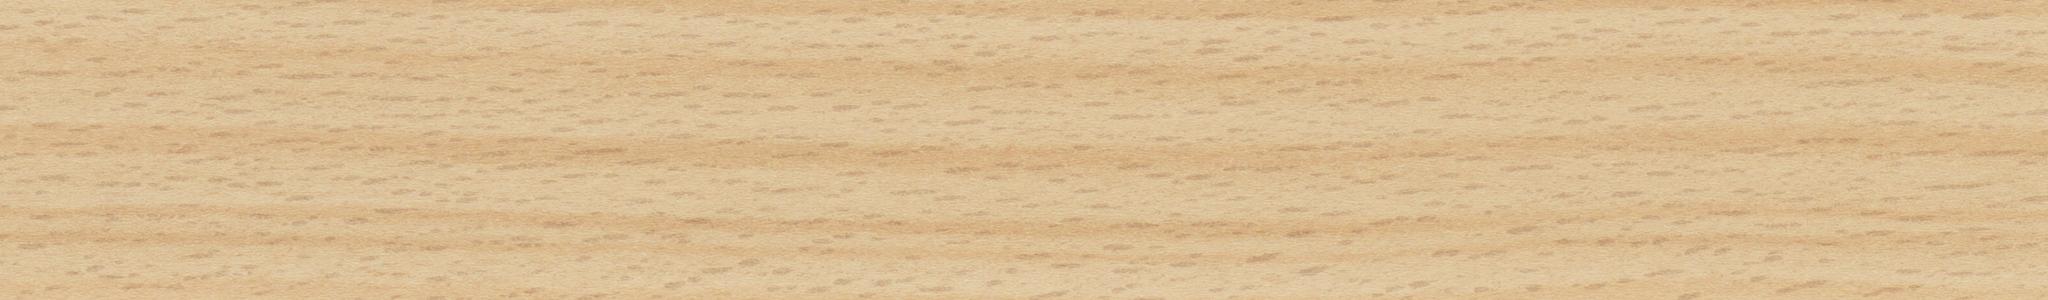 HD 41399 Melamine Edge Beech Buchlov Pearl